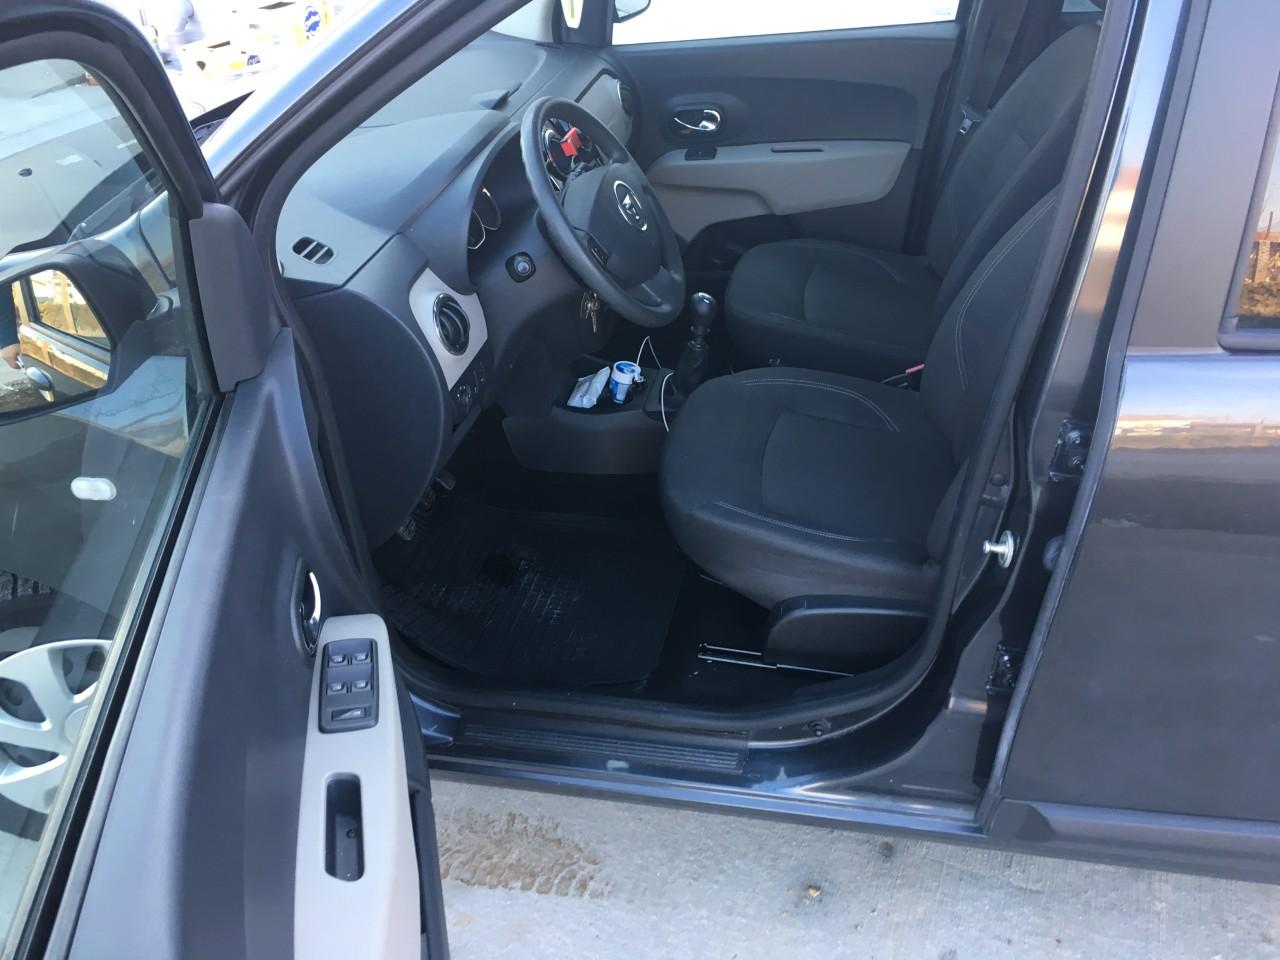 Dacia Lodgy 1.5 DCI 2012